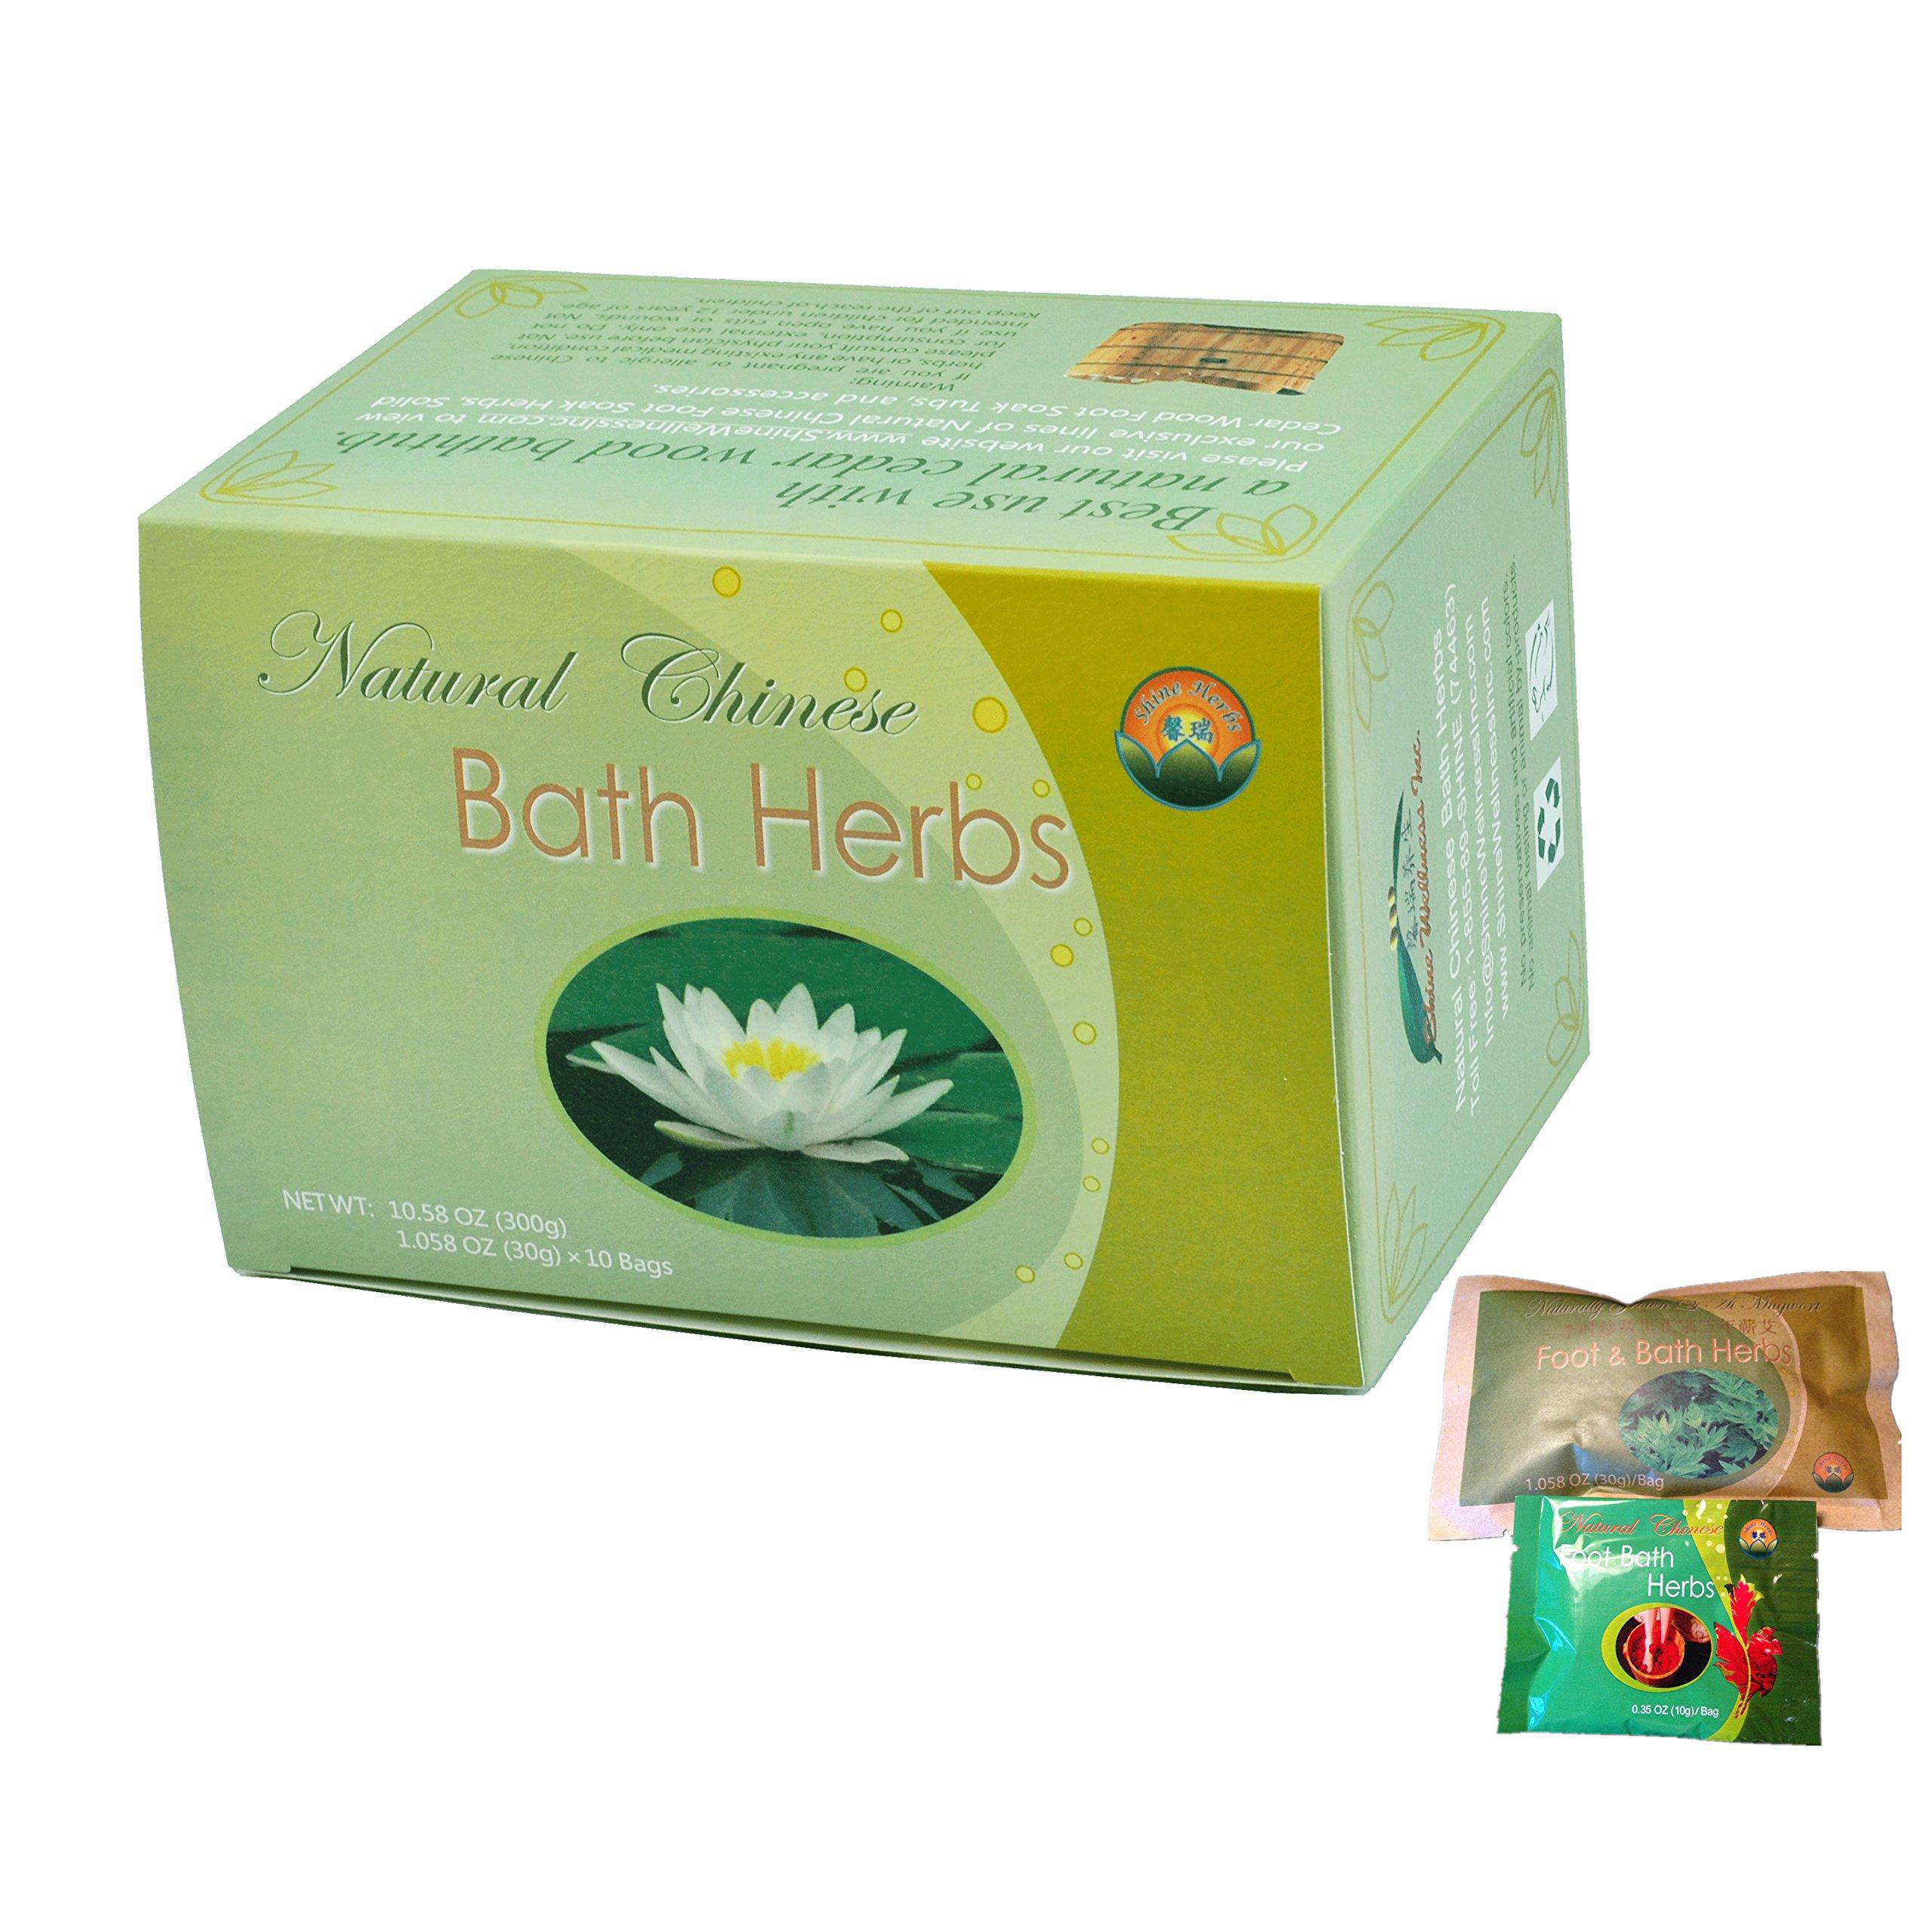 1 Box Bath Herbs Plus 2 FREE bags of Mugwort & Foot Soak Herbs samples $7 Value